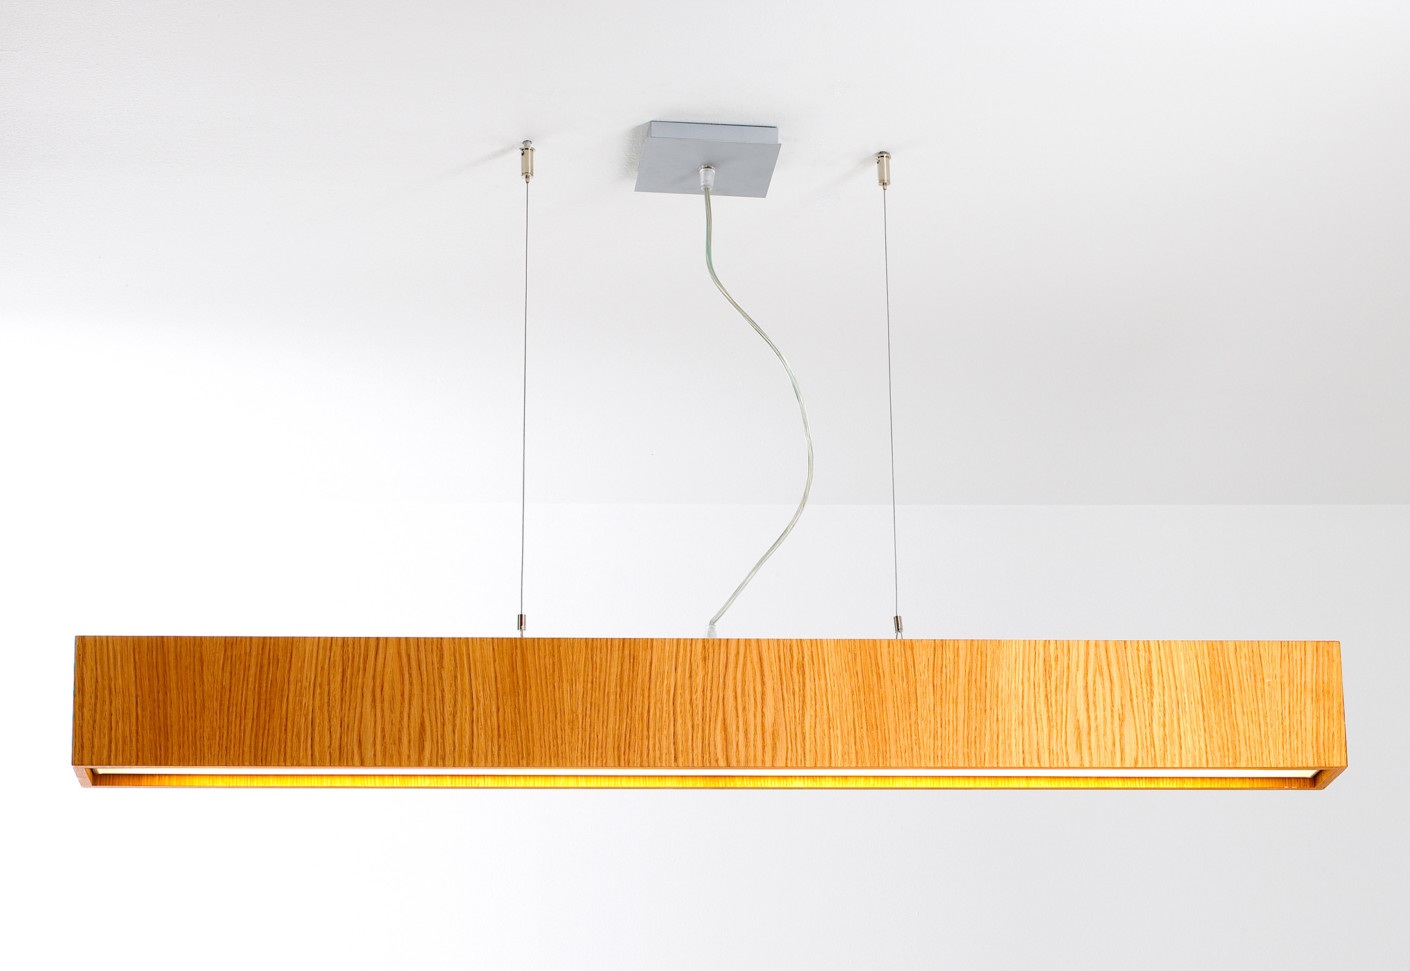 Quadrat S120x120 Lamp Pendant Lamp LED 6x24,8W - Wood wengue